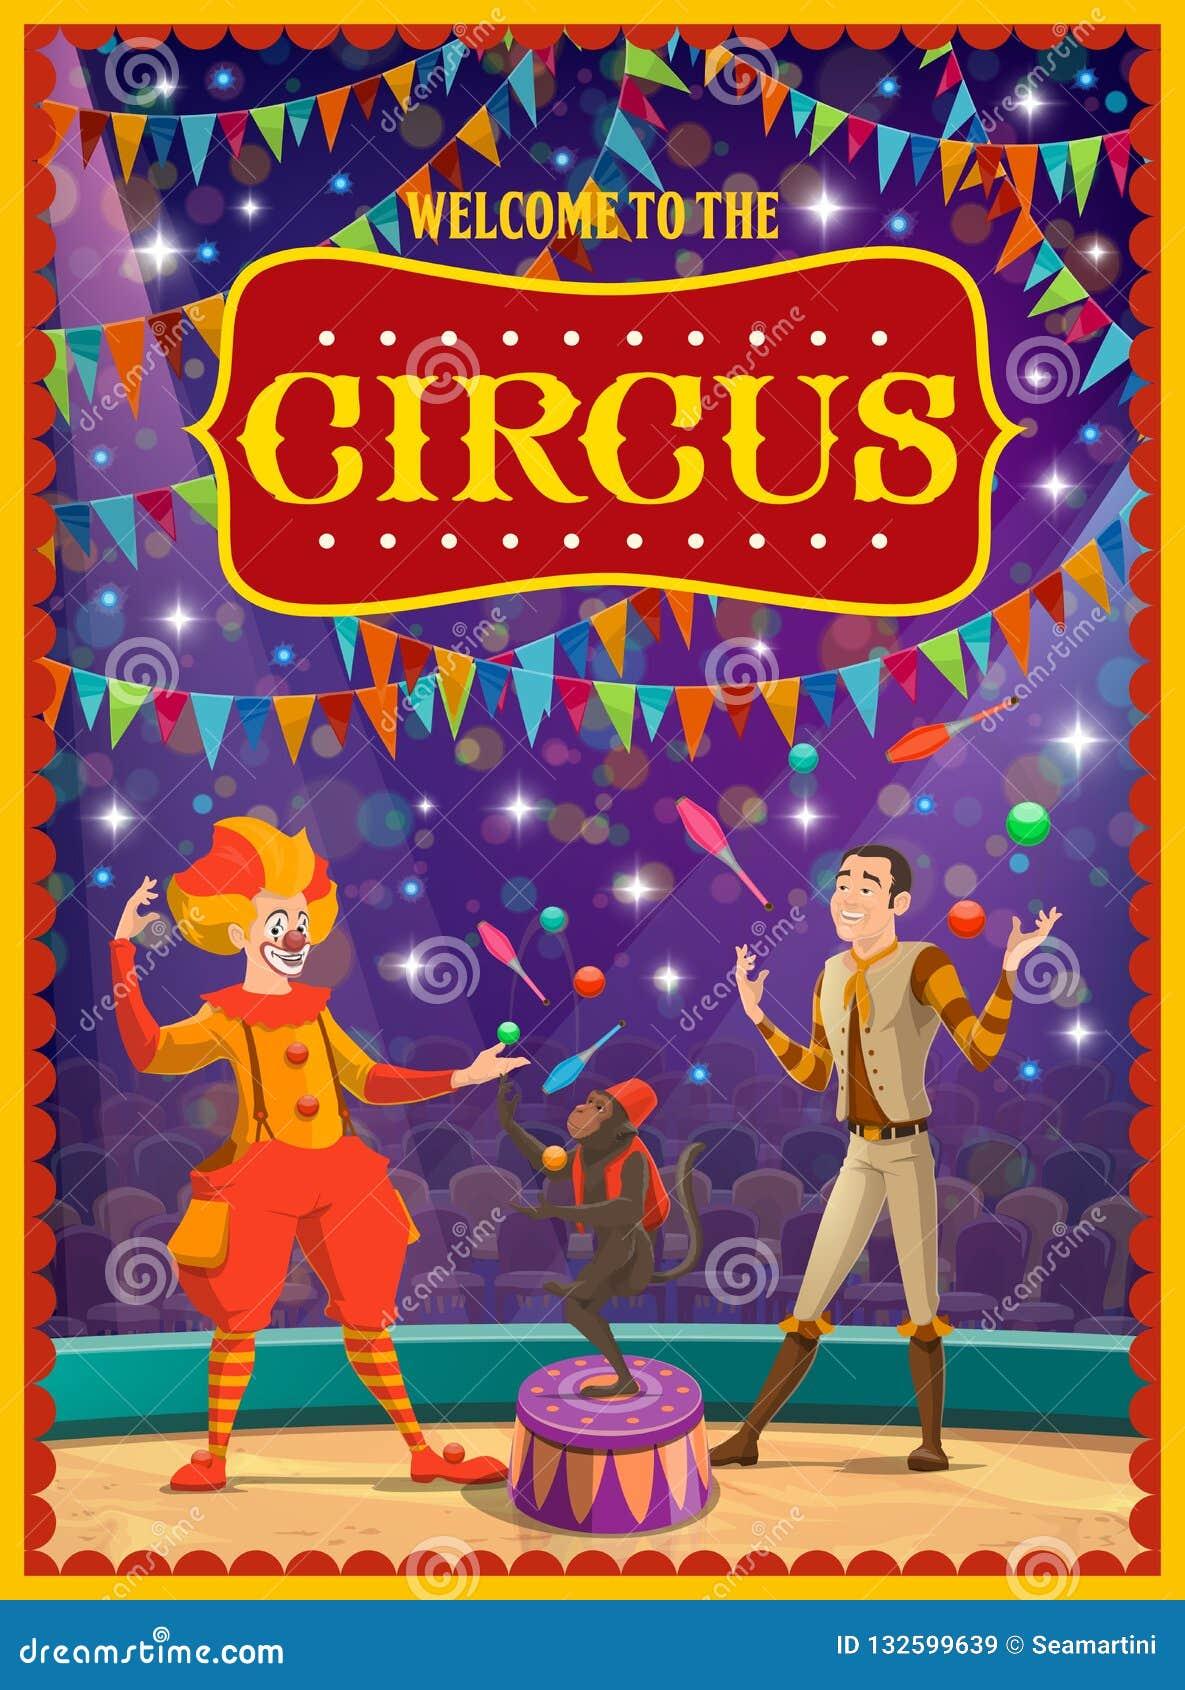 Exposition De Cirque Clown Et Jongleur Singe Qualifie